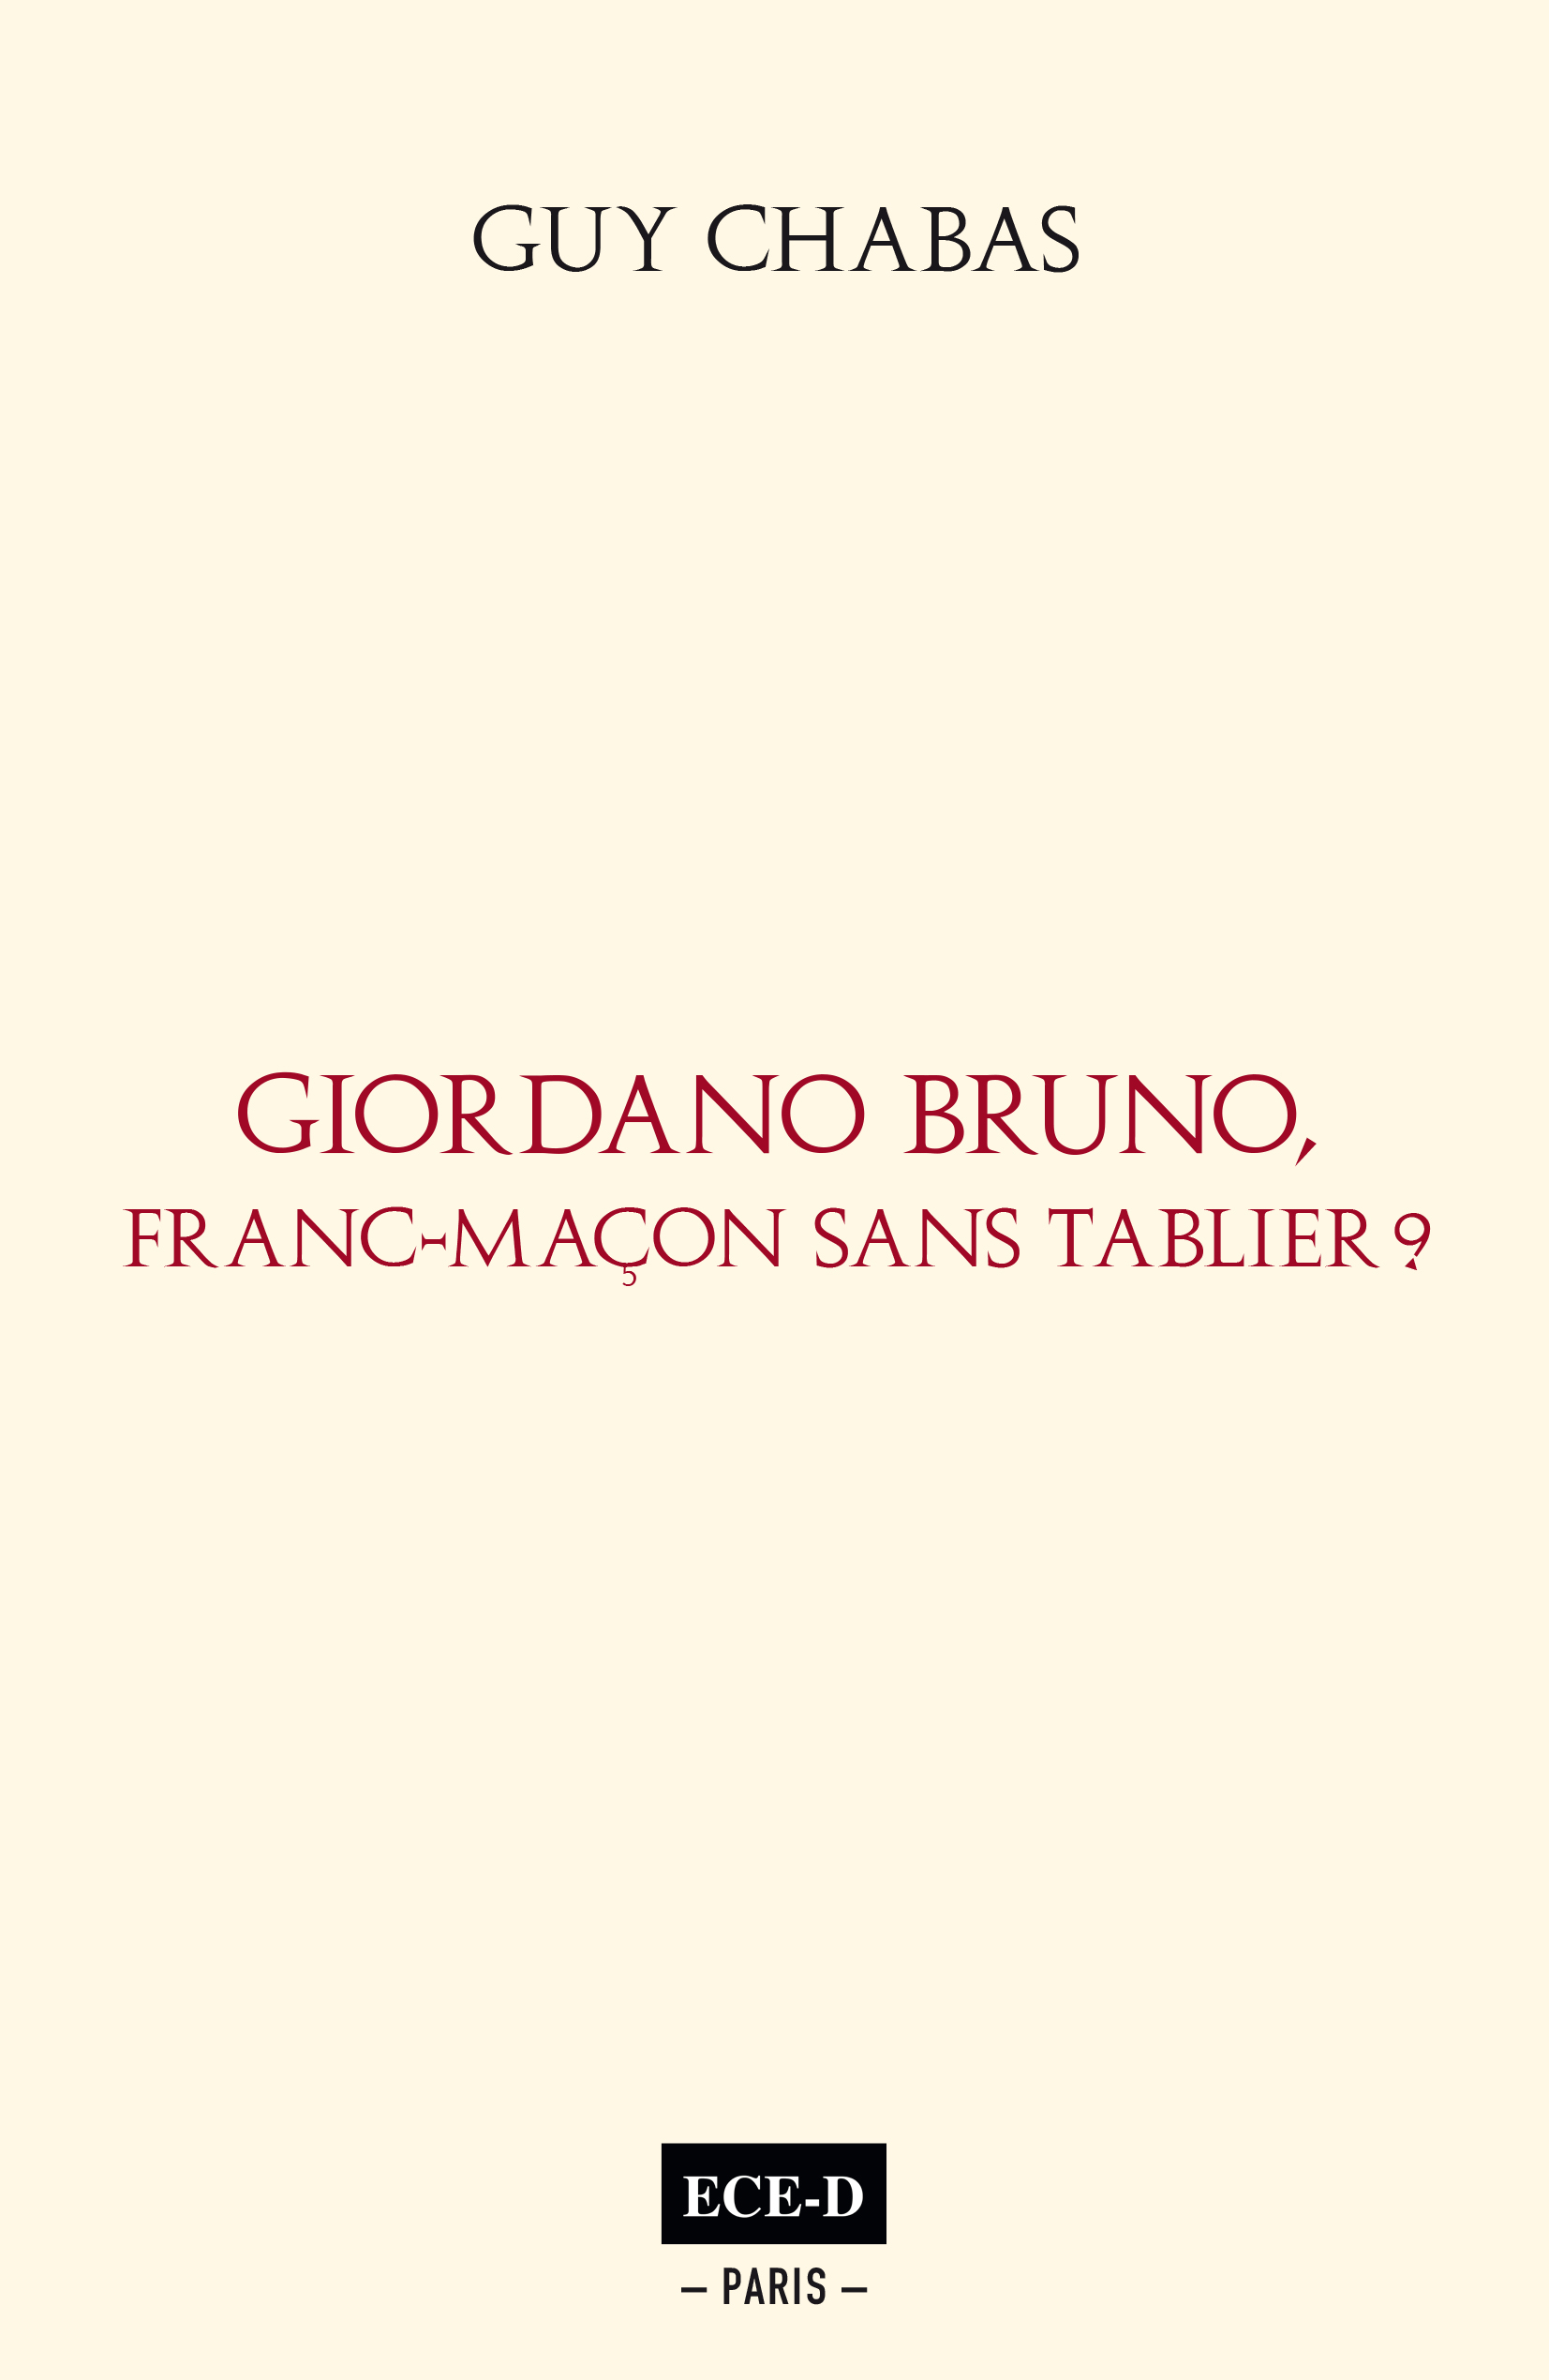 GIORDANO BRUNO, FRANC-MACON SANS TABLIER?